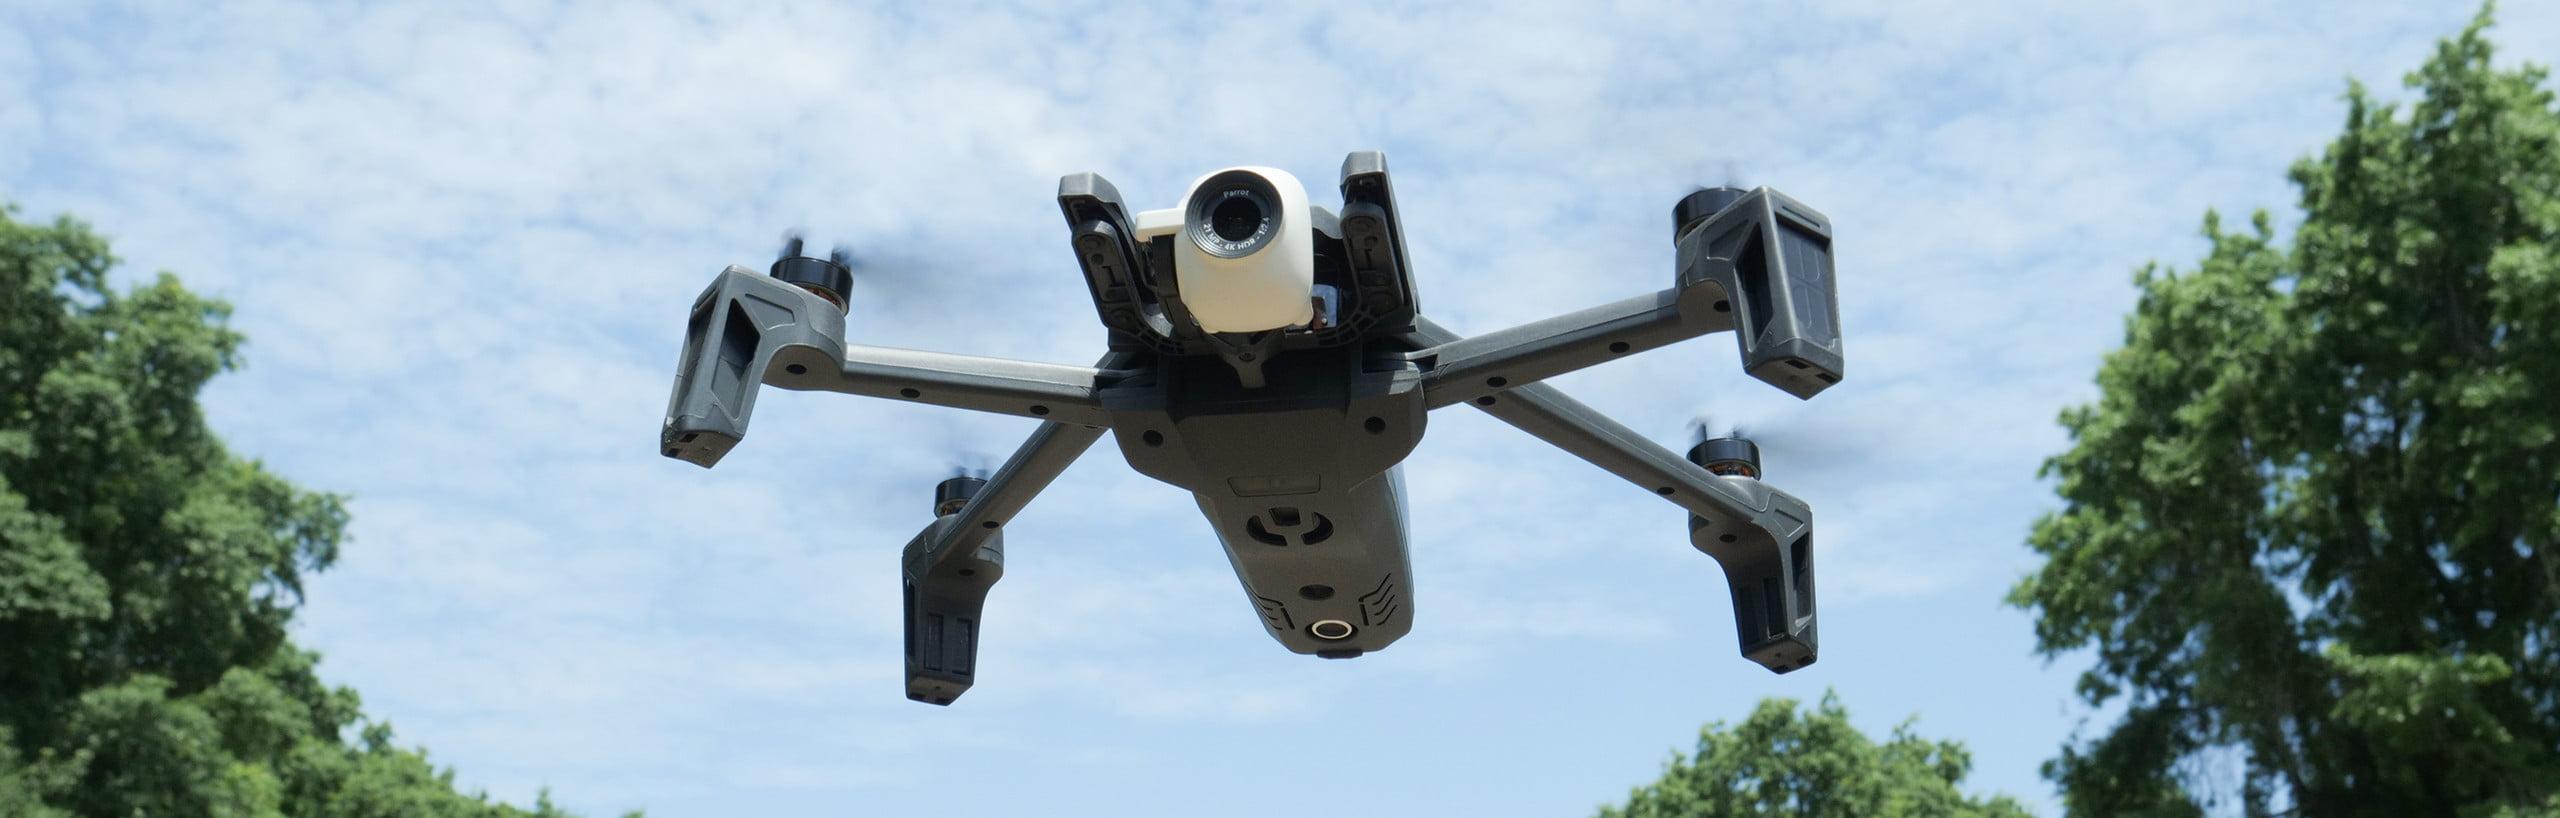 parrot-anafi-drone-review-xxl-2560x9999